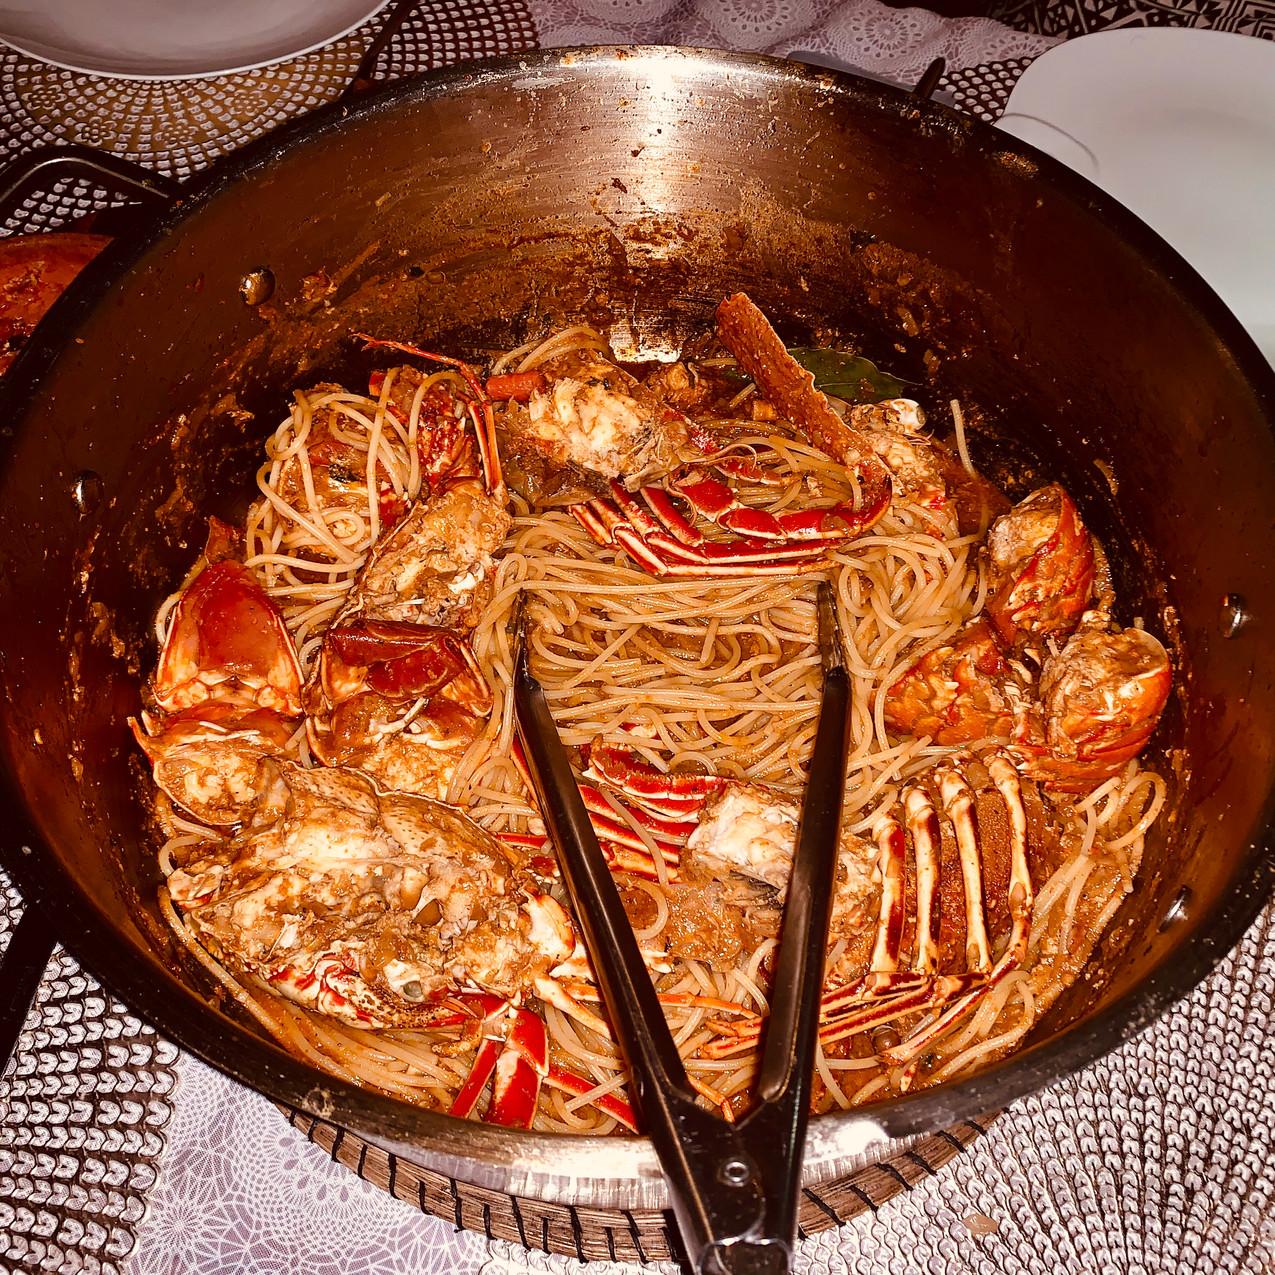 Lobster Spaghetti at Augusta Insula